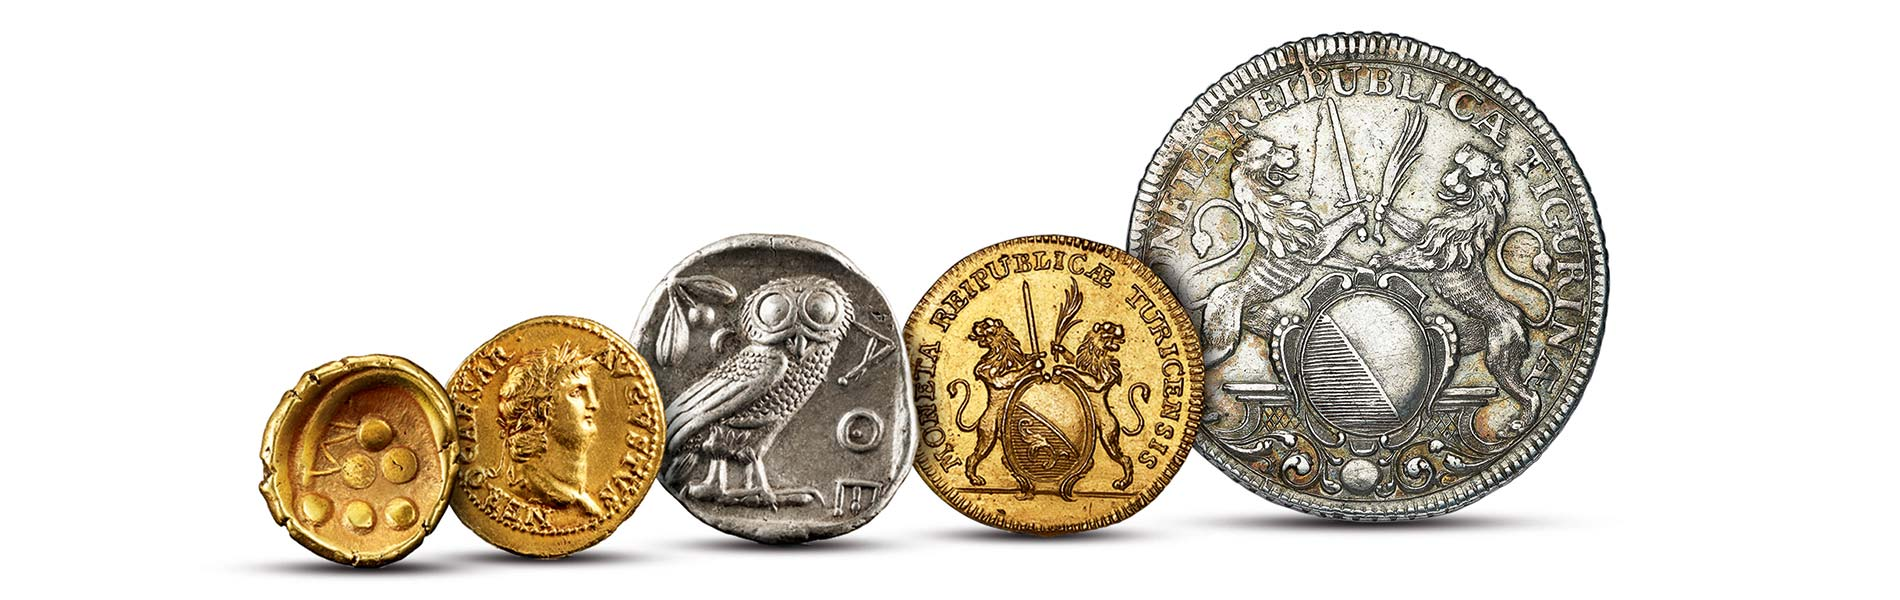 Degussa Goldhandel SA